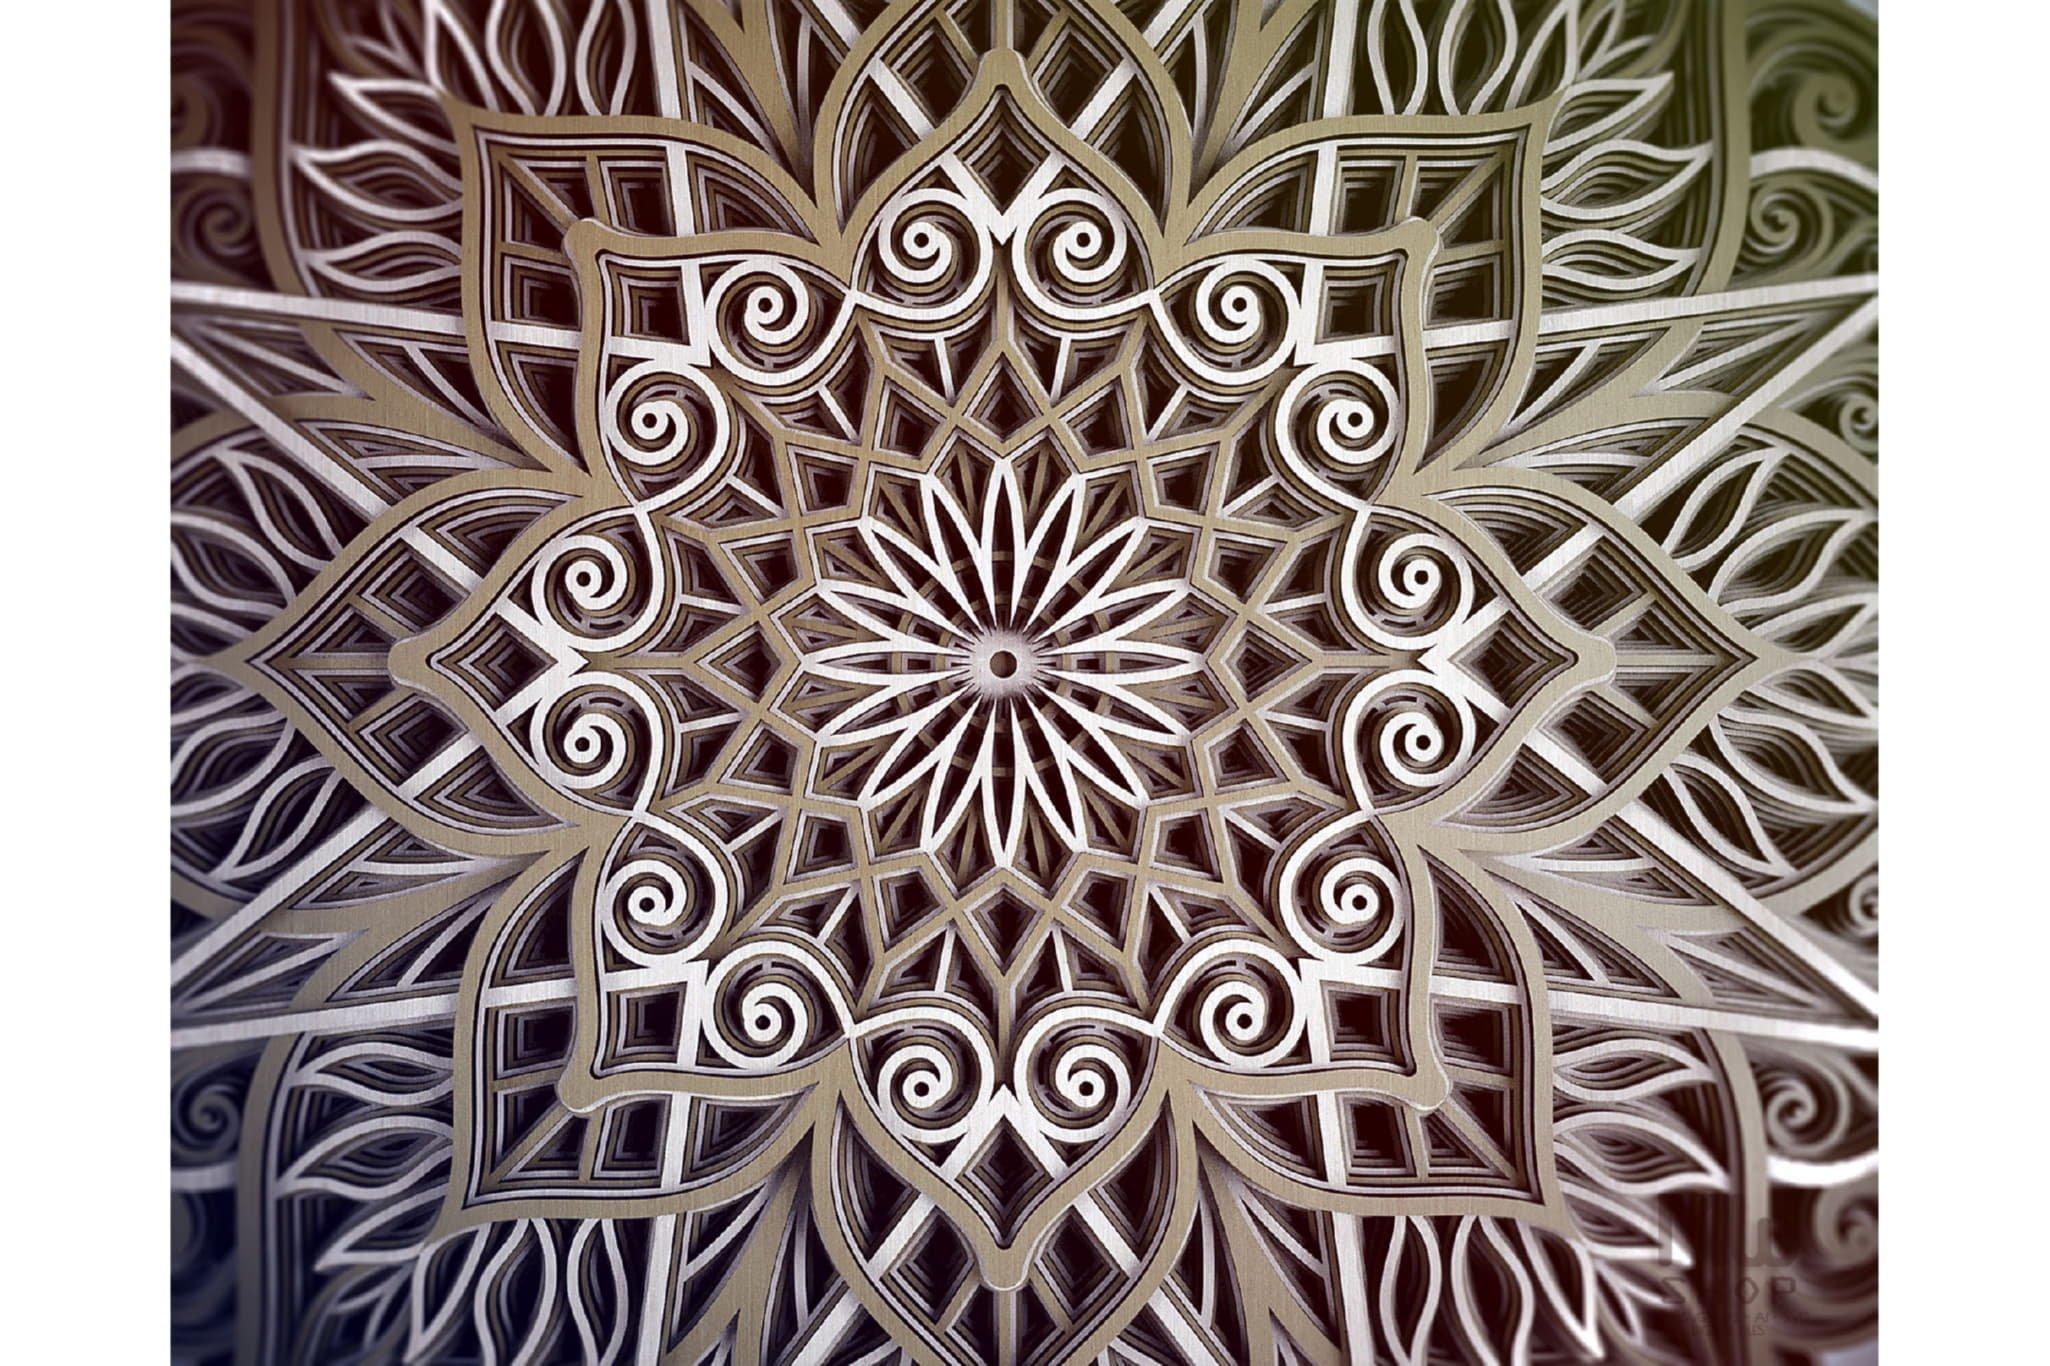 M89 - Mandala DXF Laser Cut Pattern, Flower mandala pattern example image 10